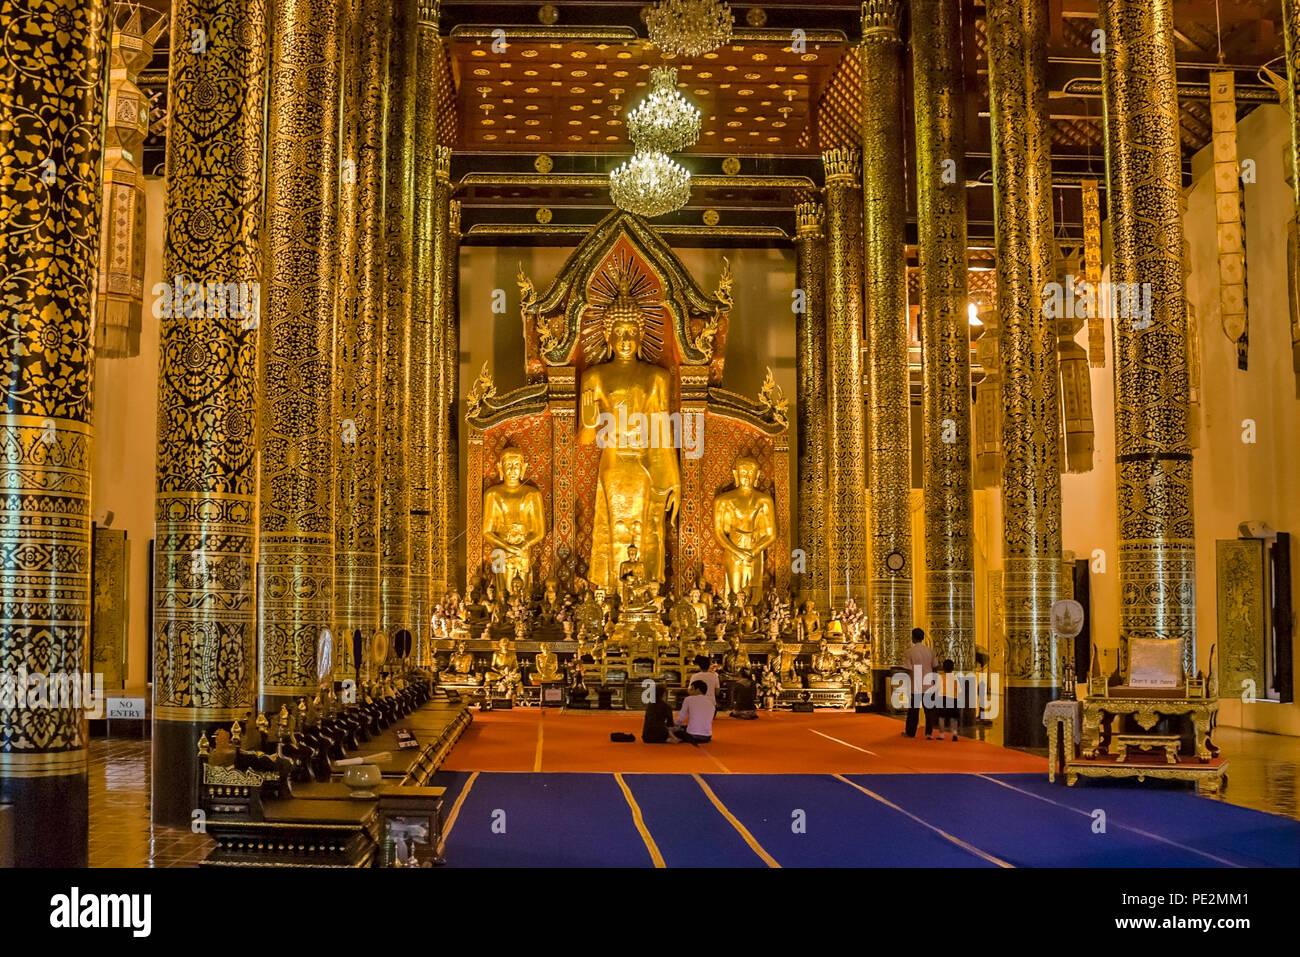 Golden Buddha im Wat Chedi Luang, Chiang Mai, Nord Thailand | Goldener Buddha im Wat Chedi Luang, Chiang Mai, Nordthailand Stockbild